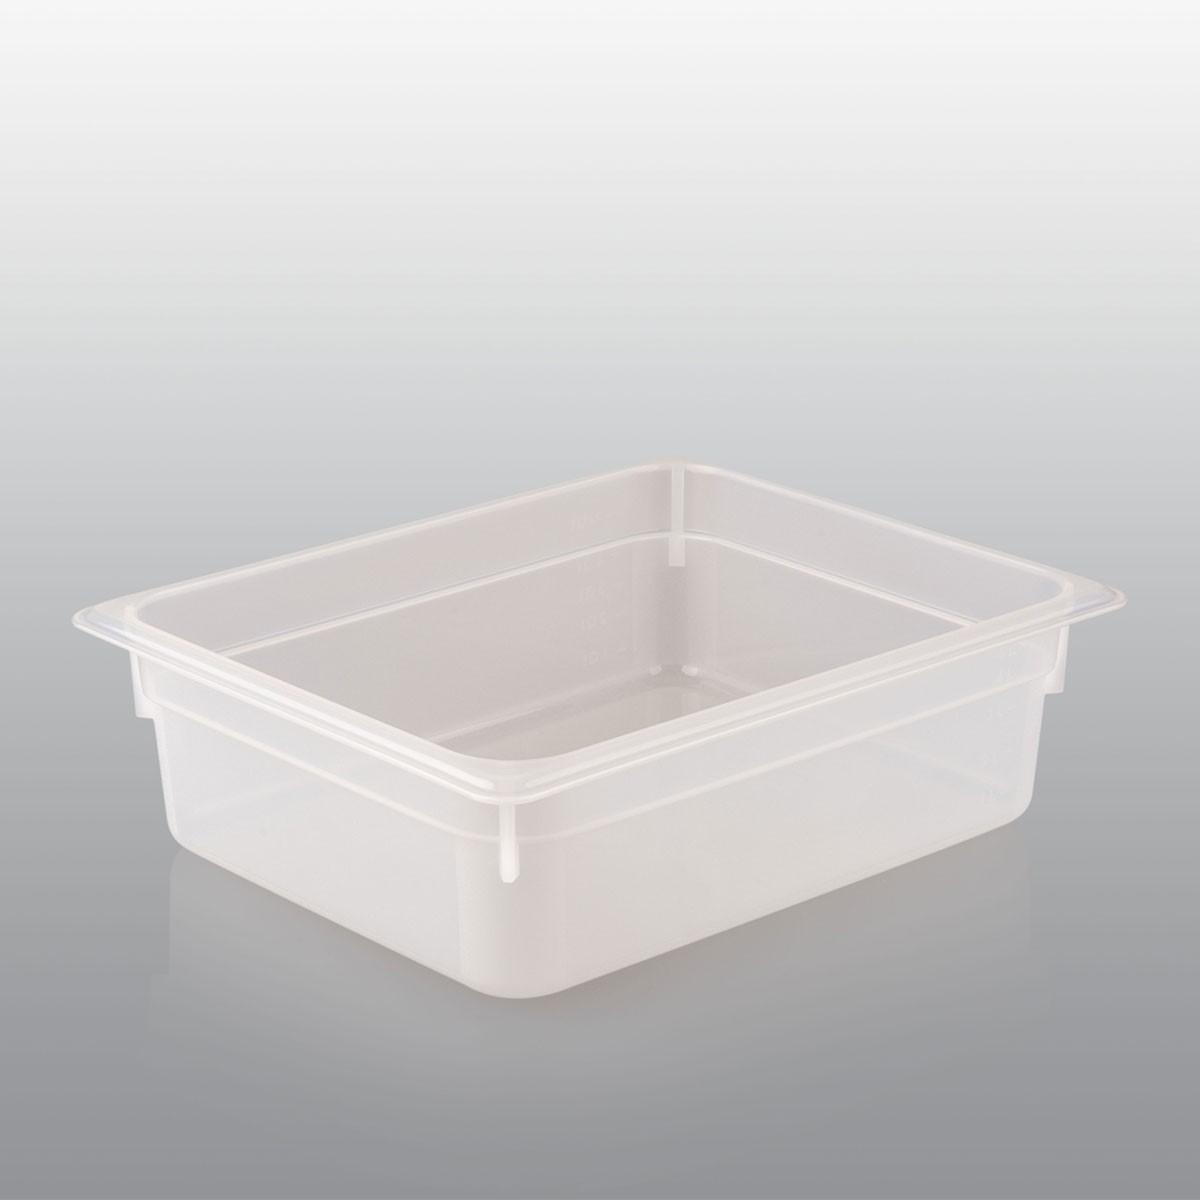 GN Behälter GN 1/2 aus Polypropylen (Tiefe: 200mm) 12,5 L Saro